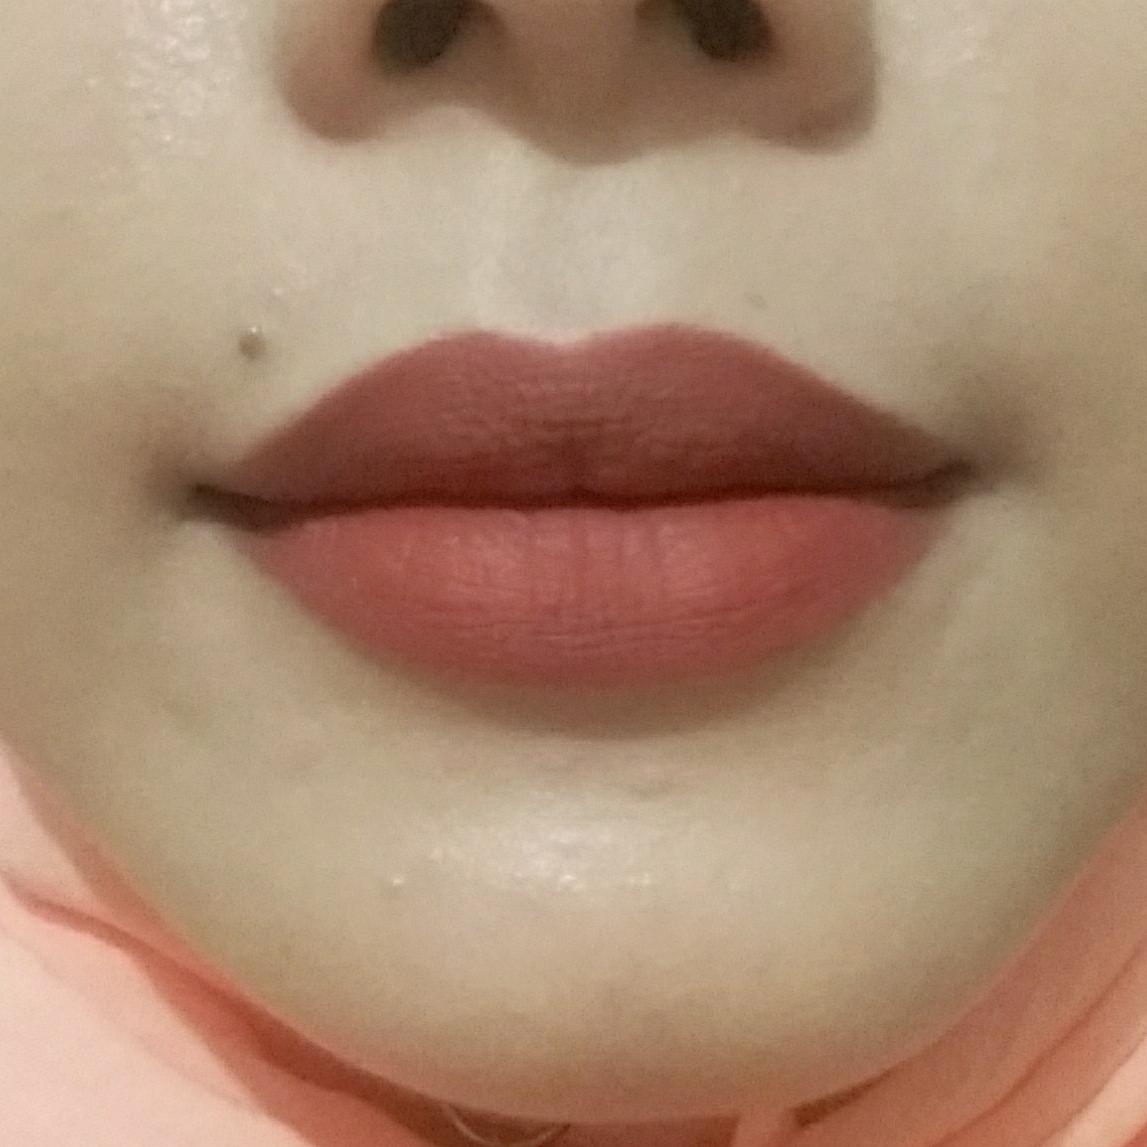 Lipstik Purbasari No 86 Color Matte Bancidandan Review Lipstick